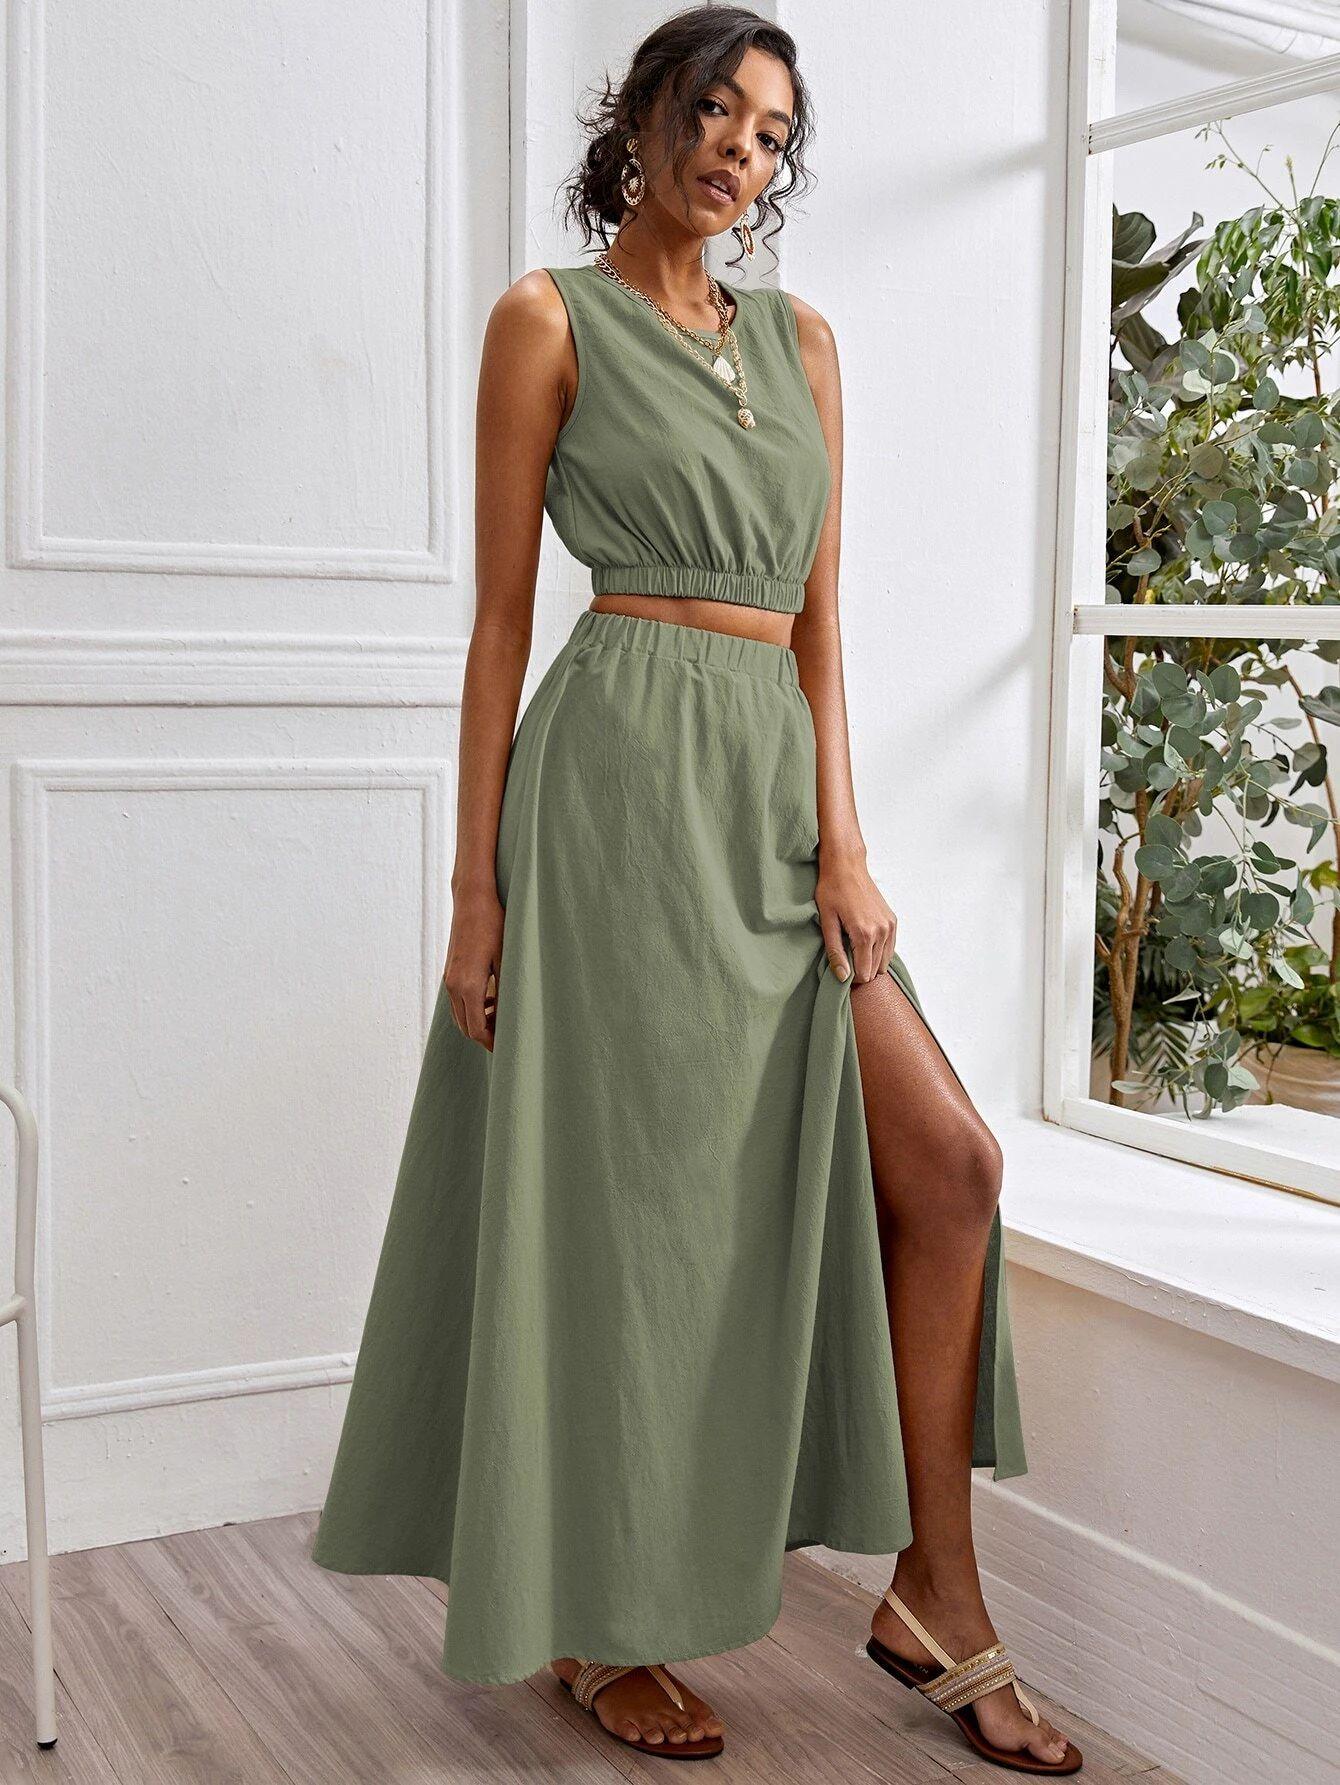 Solid Tank Top & Split Thigh Skirt